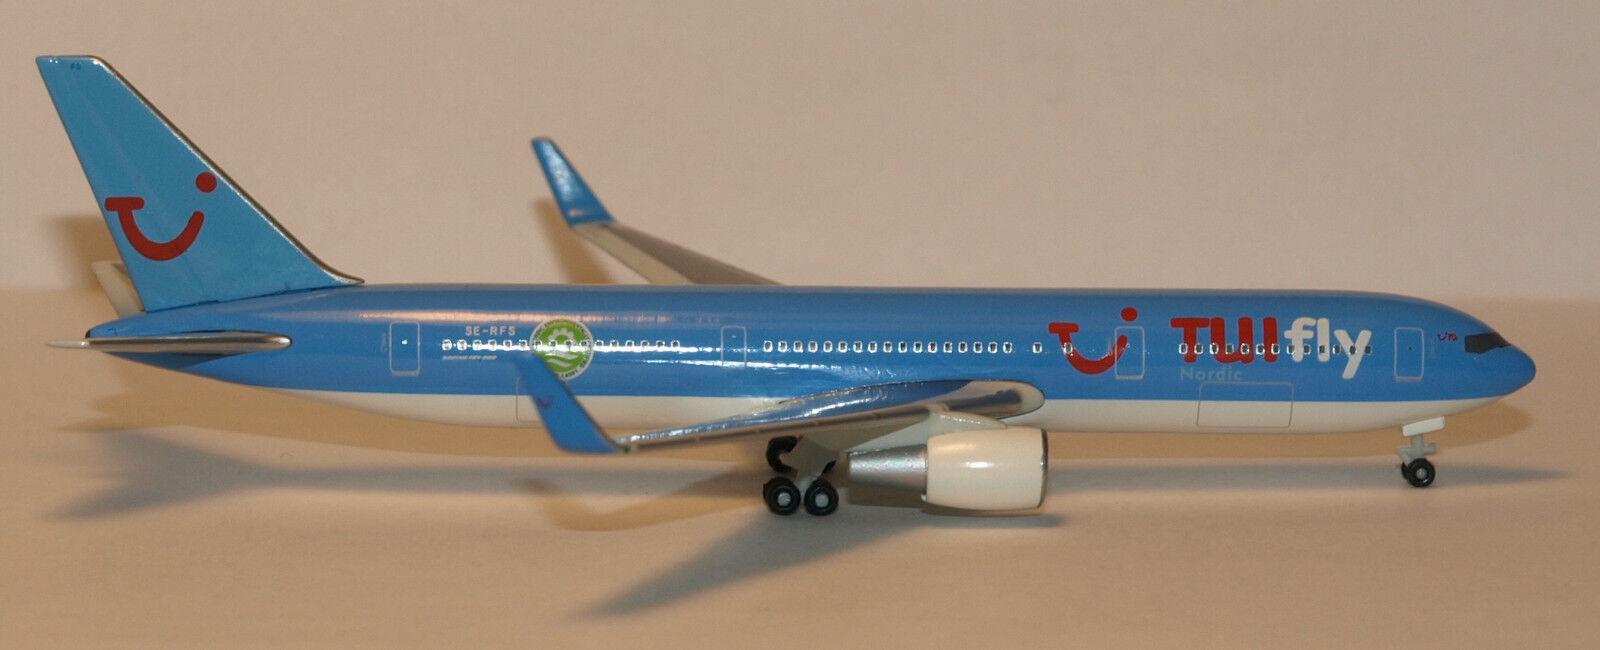 Herpa Wings 1:500 TUIfly Nordic 767-300 prod id 519281 released 2012